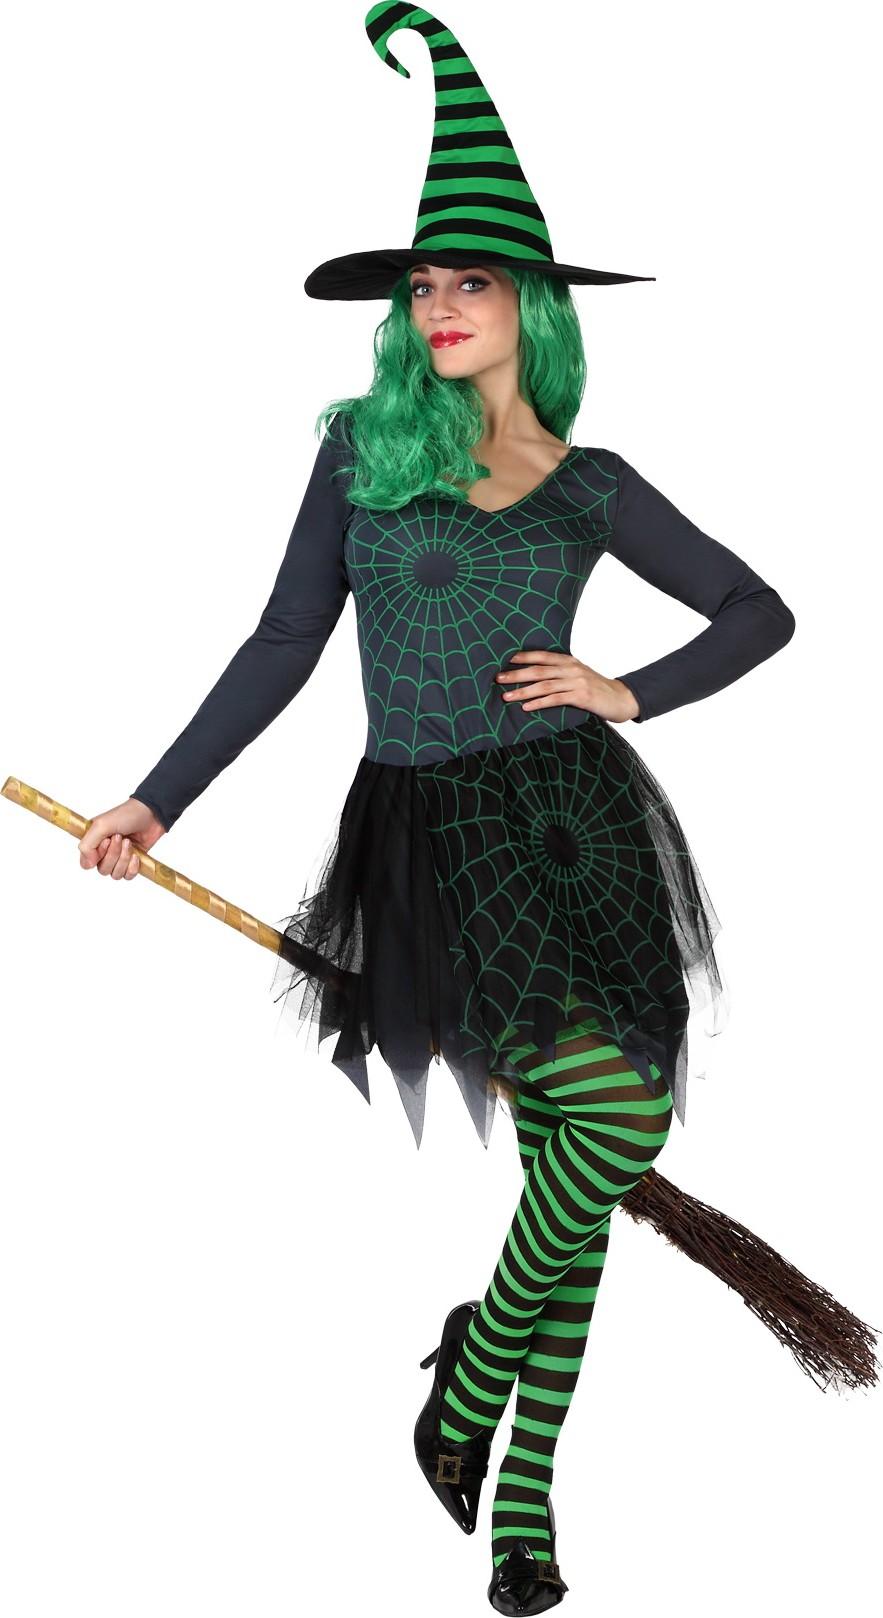 p halloween grunes spinnennetz hexe kostum fur damen type=product